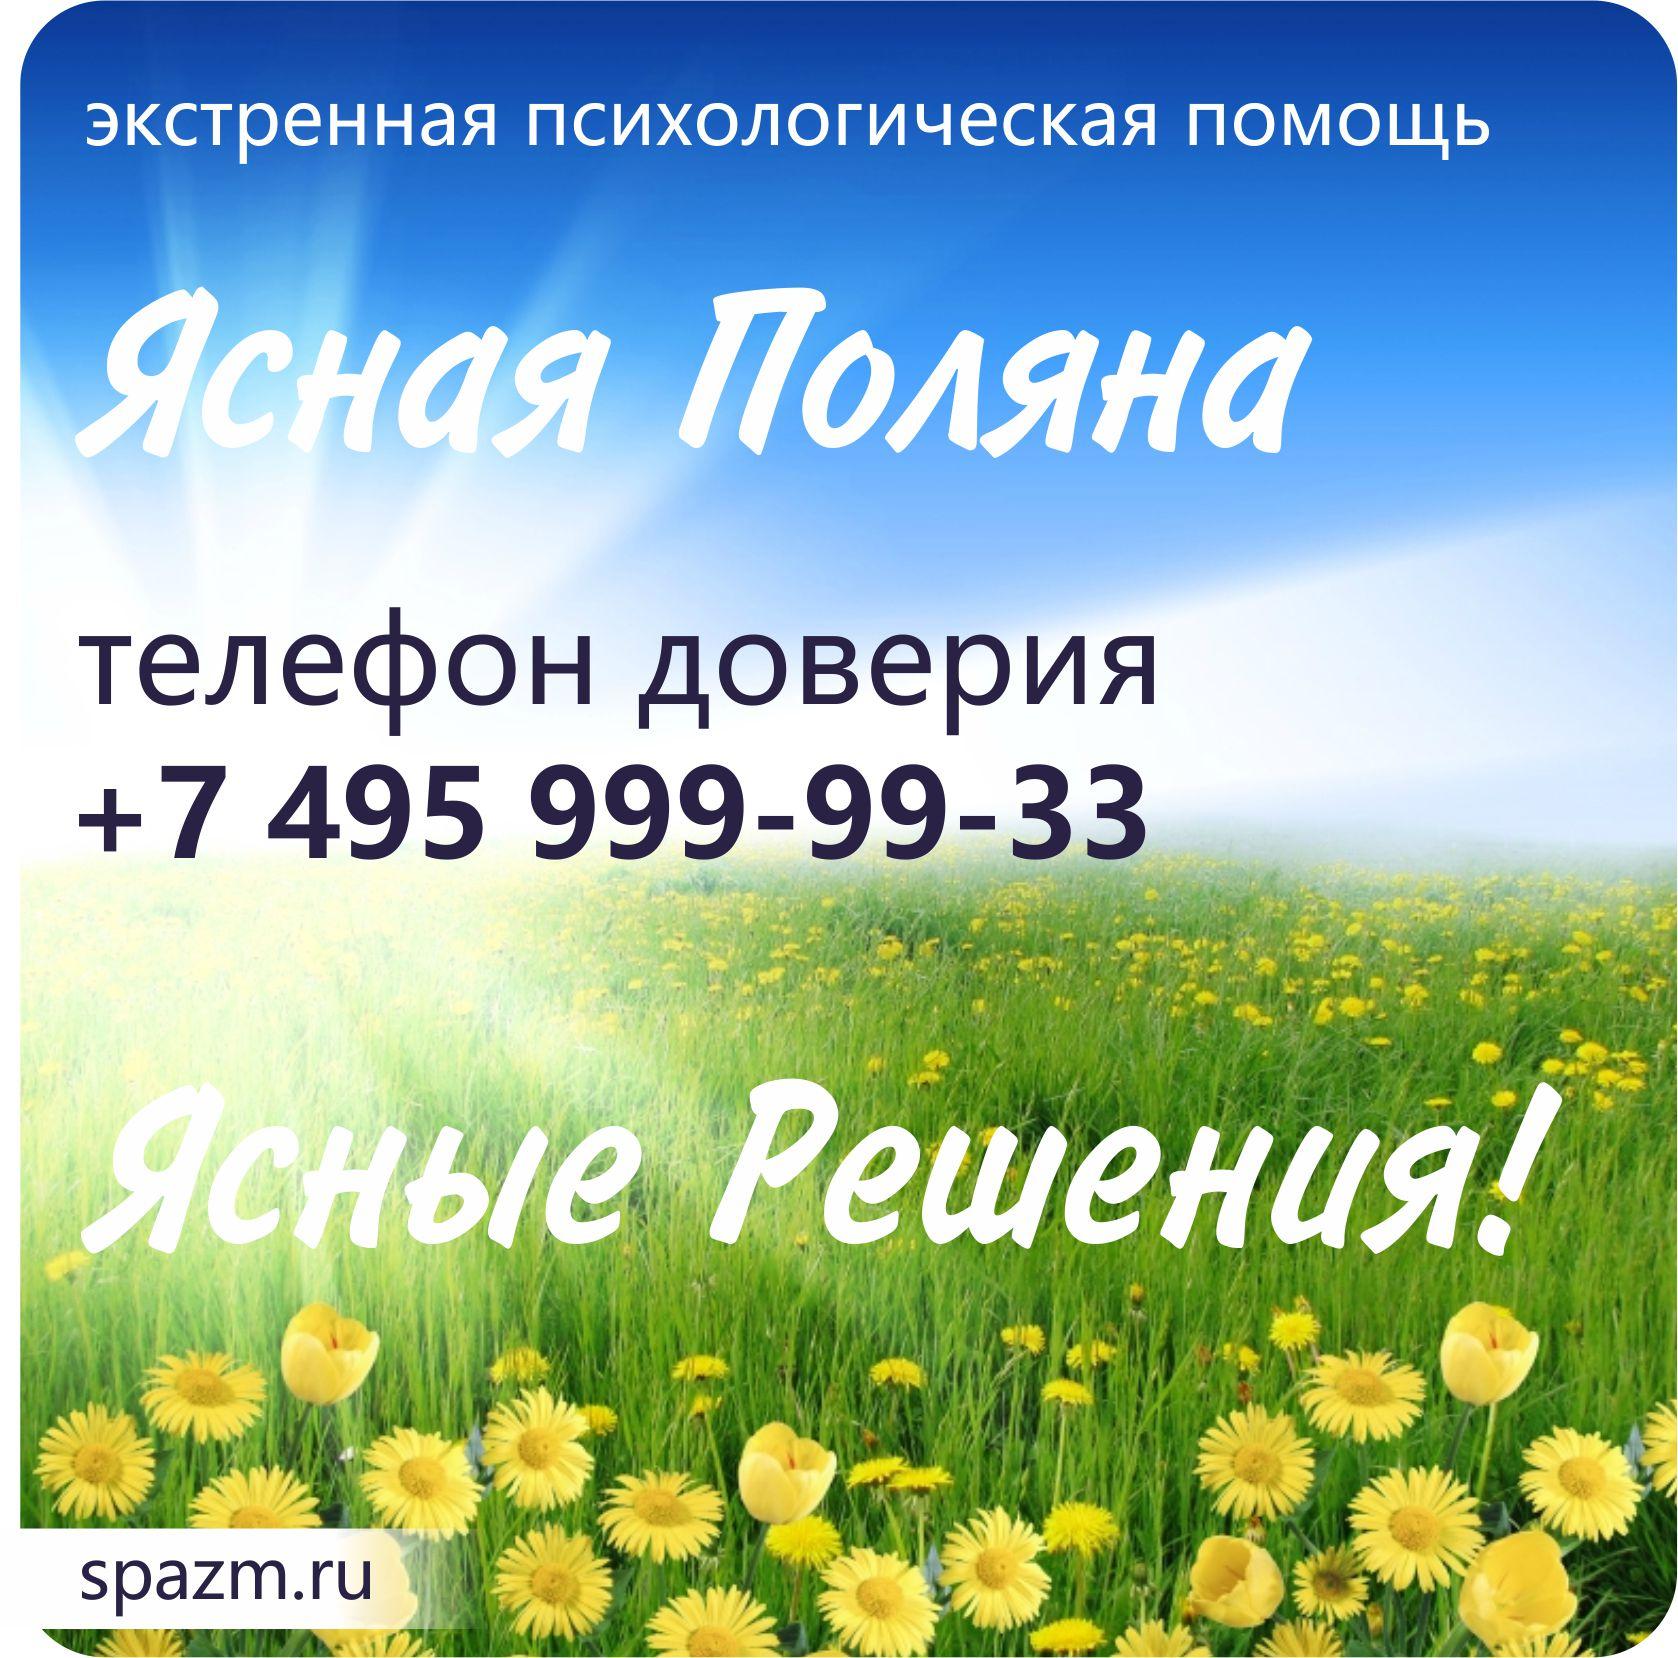 Логотип для сайта психологического телефона доверия фото f_17757b2ce08758cb.jpg